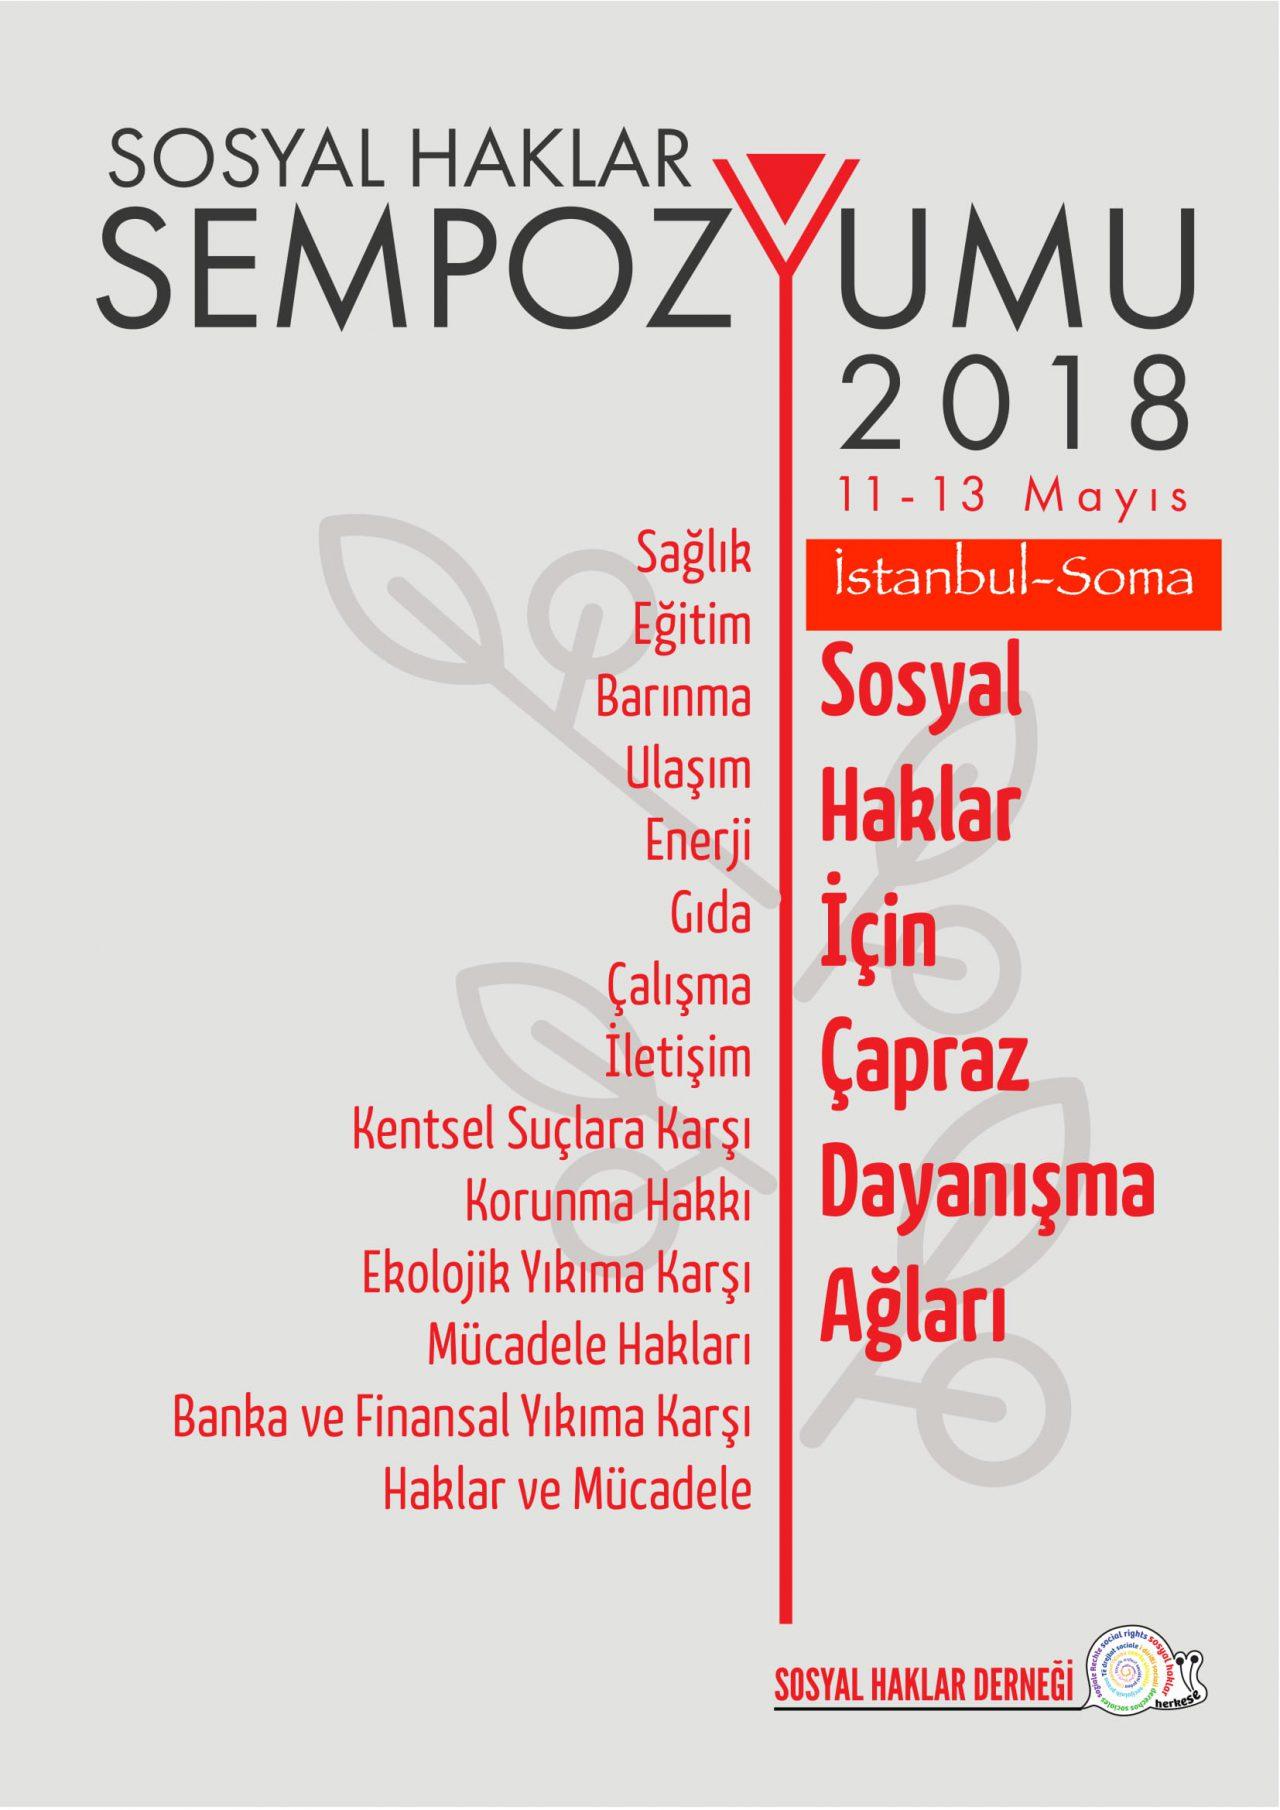 sosyal-haklar-sempozyumu_duyuru-1-1280x1810.jpg